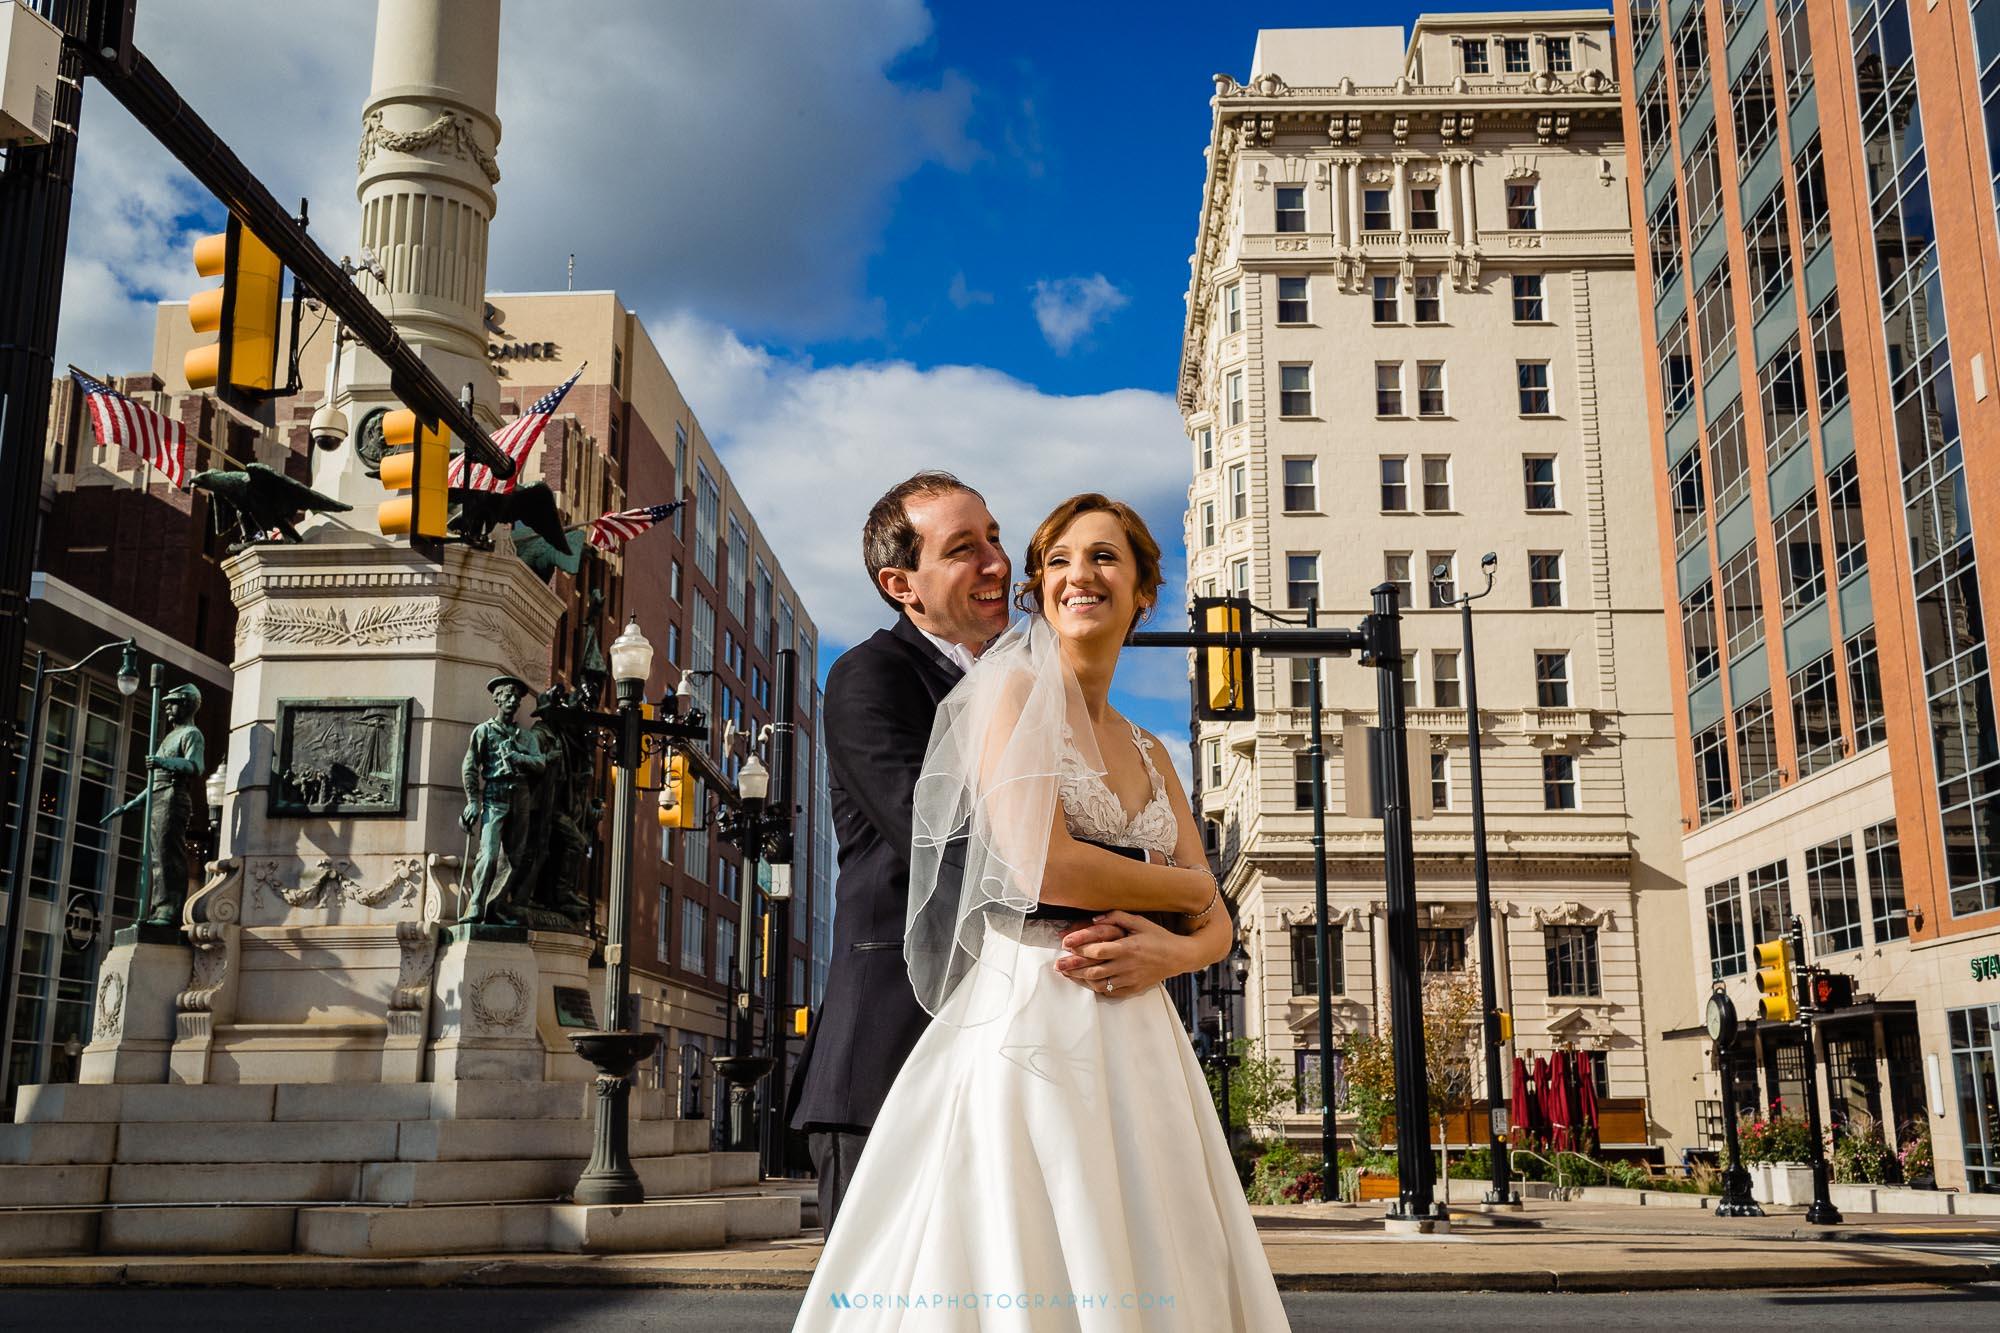 Ilhana & Jonathan Wedding at Vault 634 - Allentown 0046.jpg